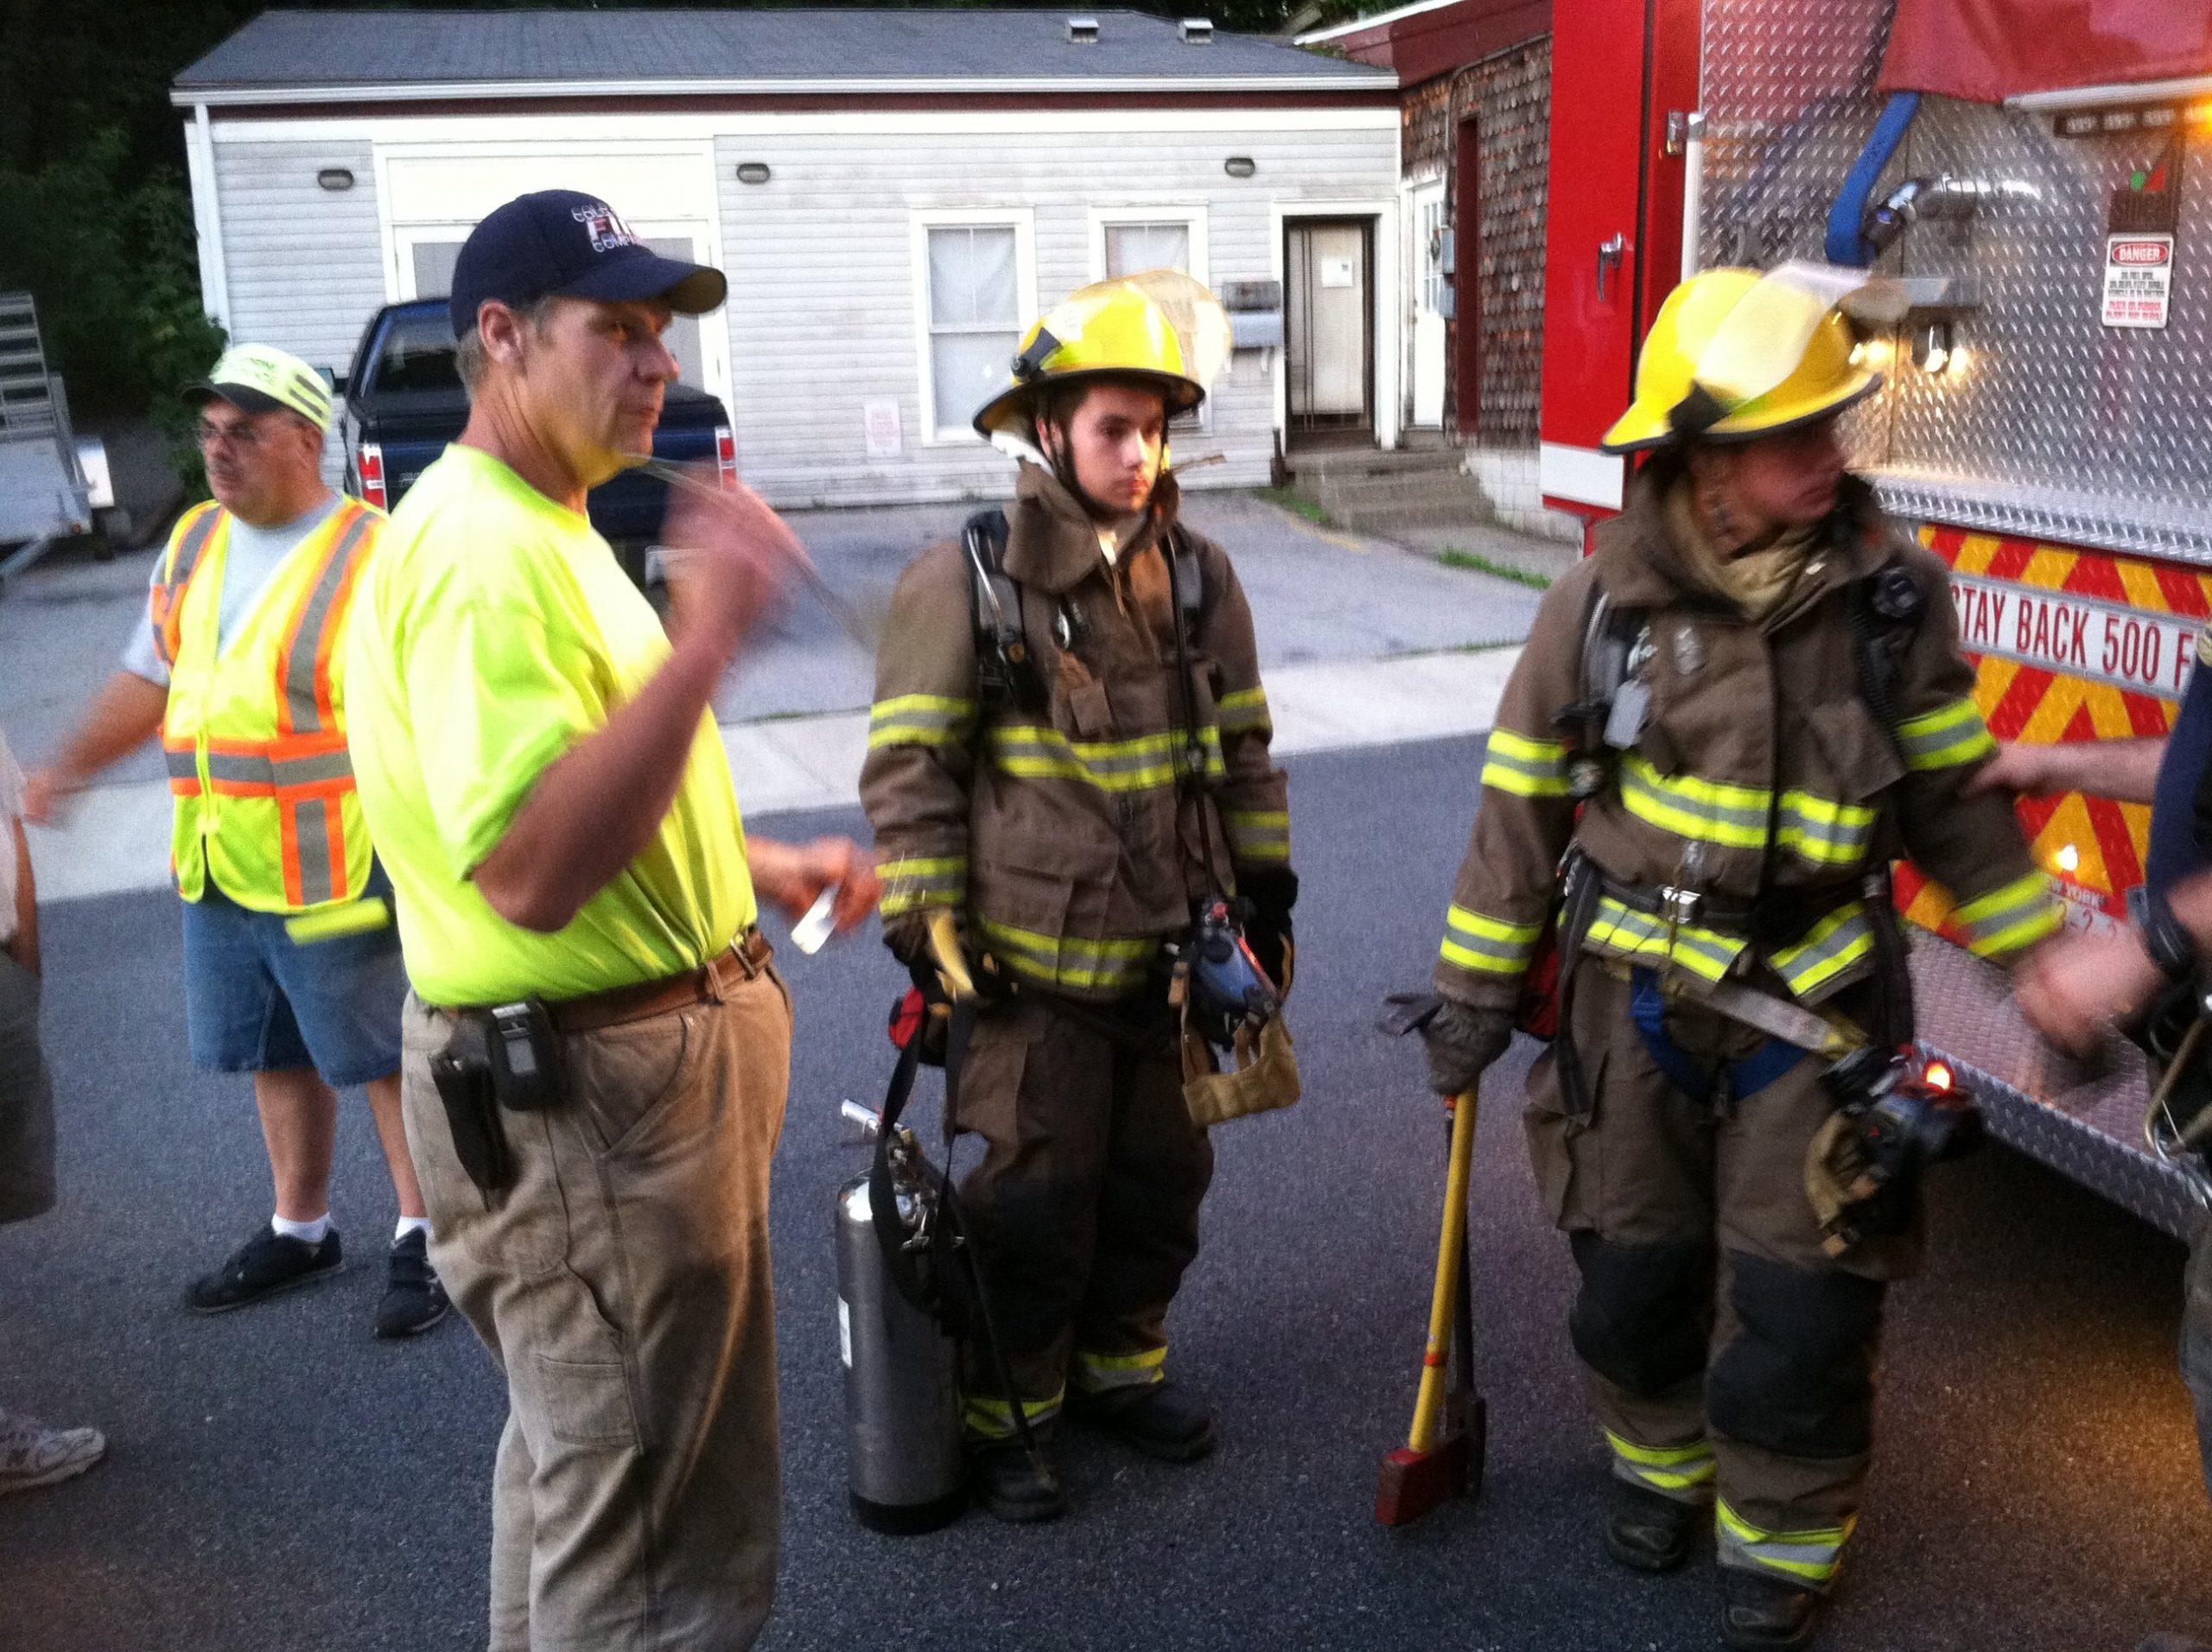 Csfc Interior Firefighter / Driver Training Drill » Cold Blank Training Calendar Tueday Nights